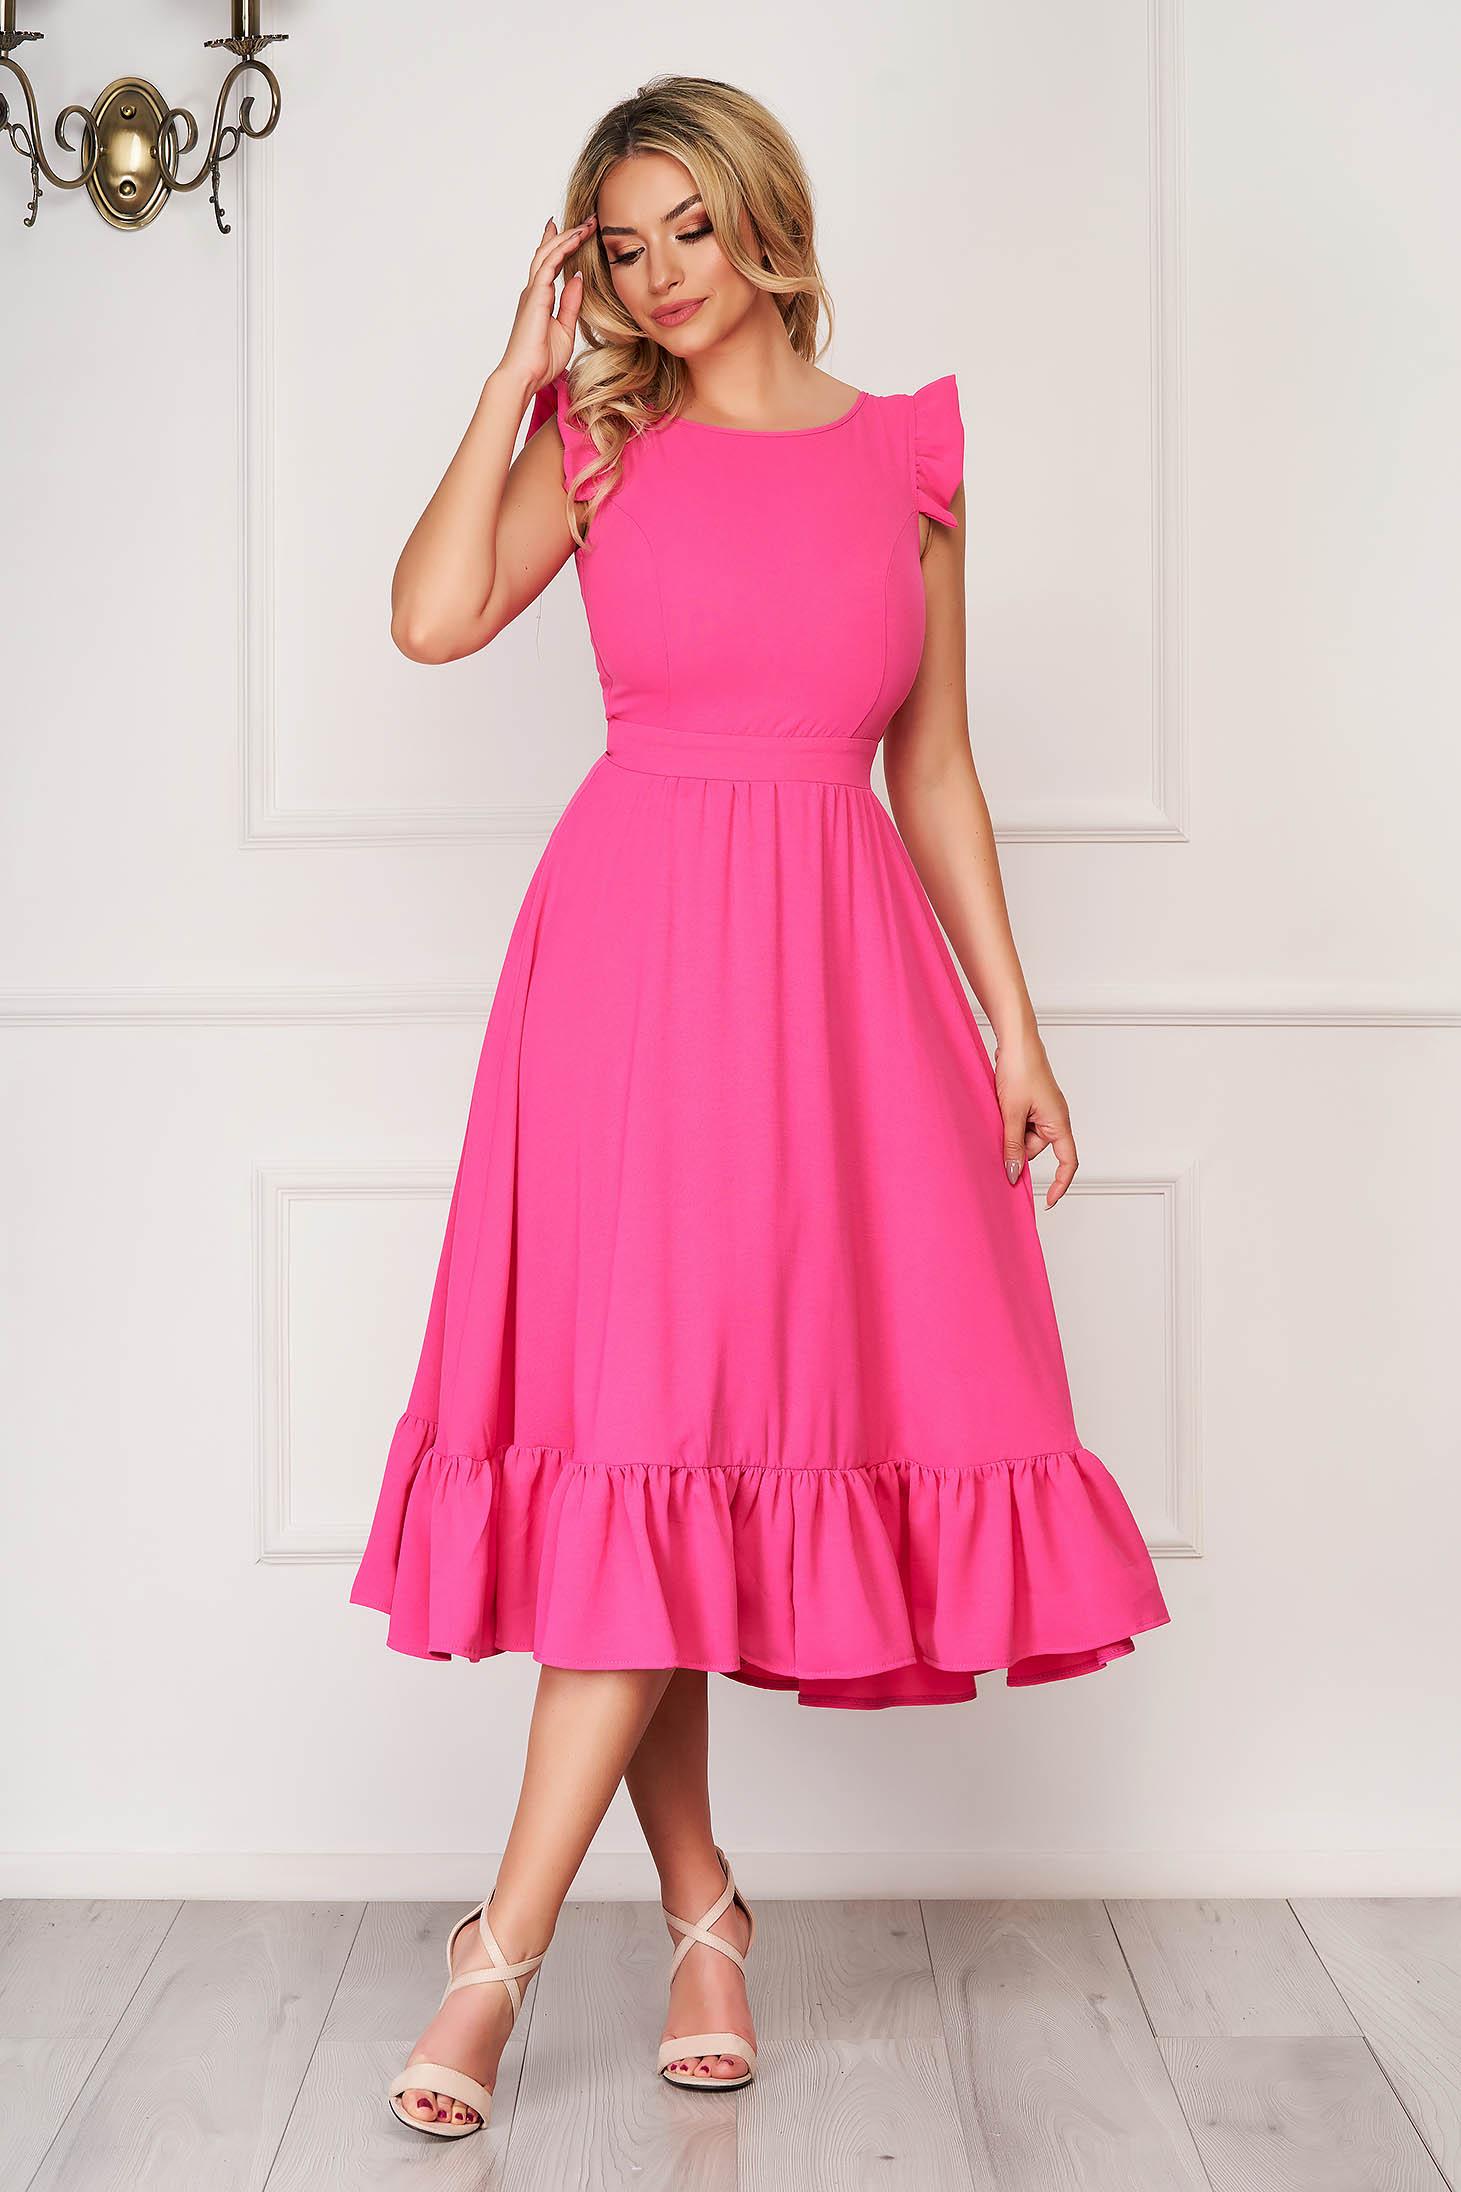 Rochie StarShinerS roz eleganta midi din stofa creponata cu volanase